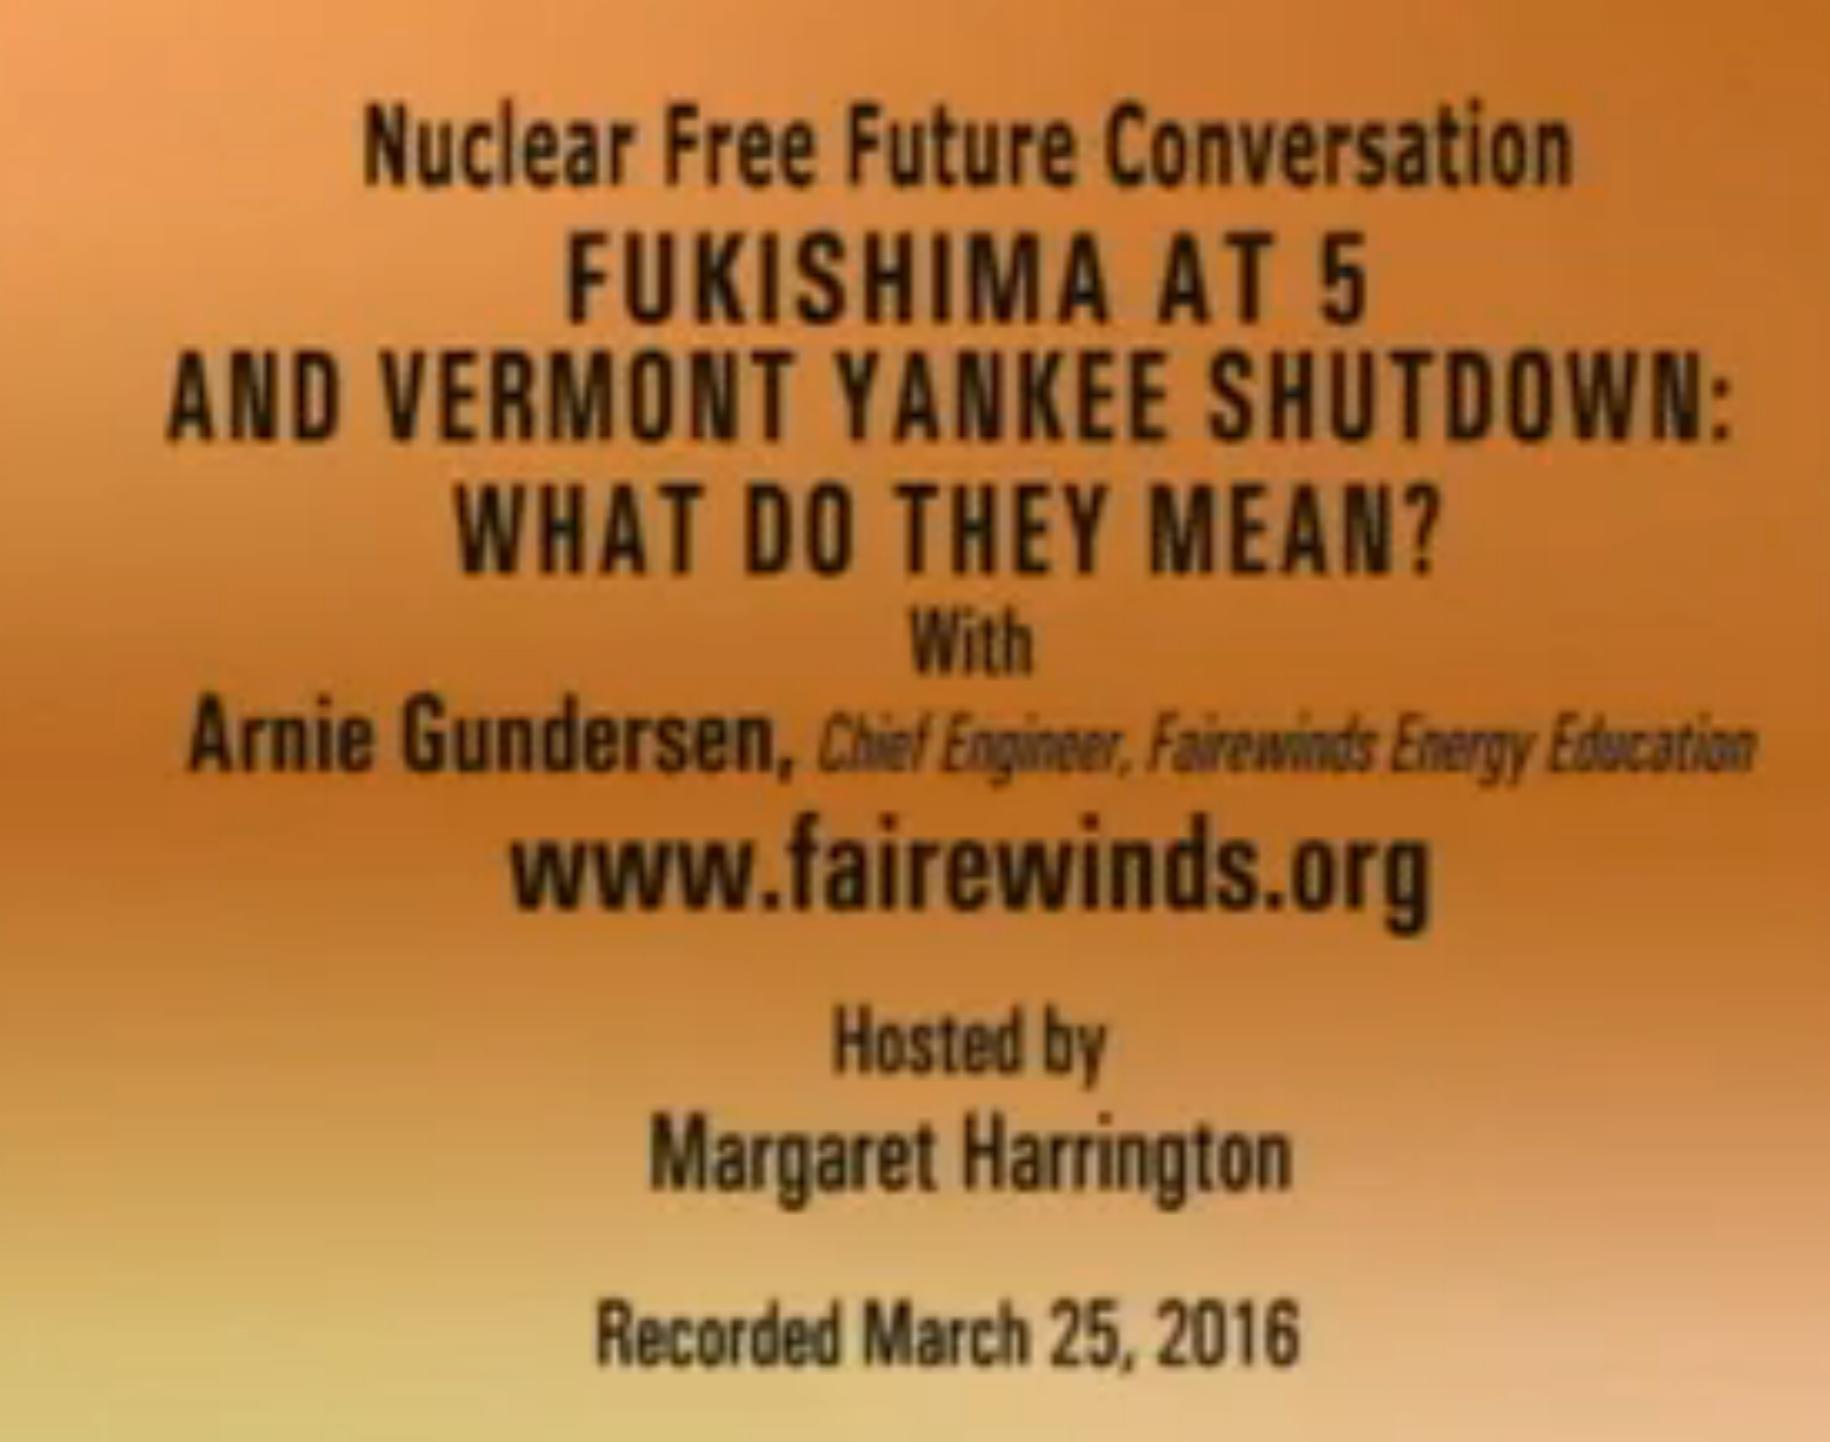 NukeFreeFuture_Fukushima5.png